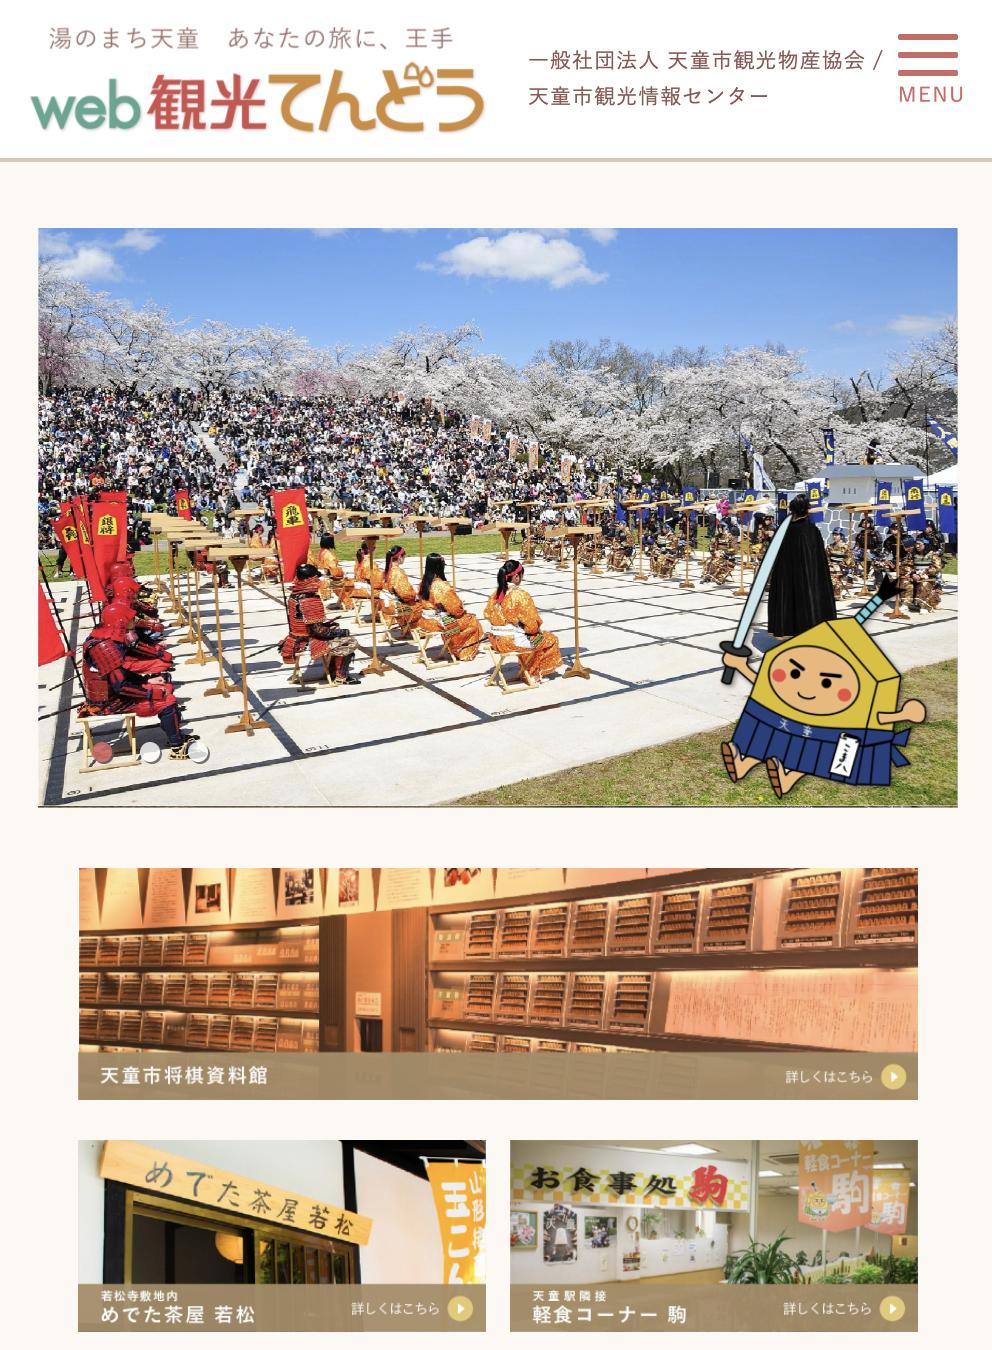 web観光てんどう|天童市観光物産協会:画像